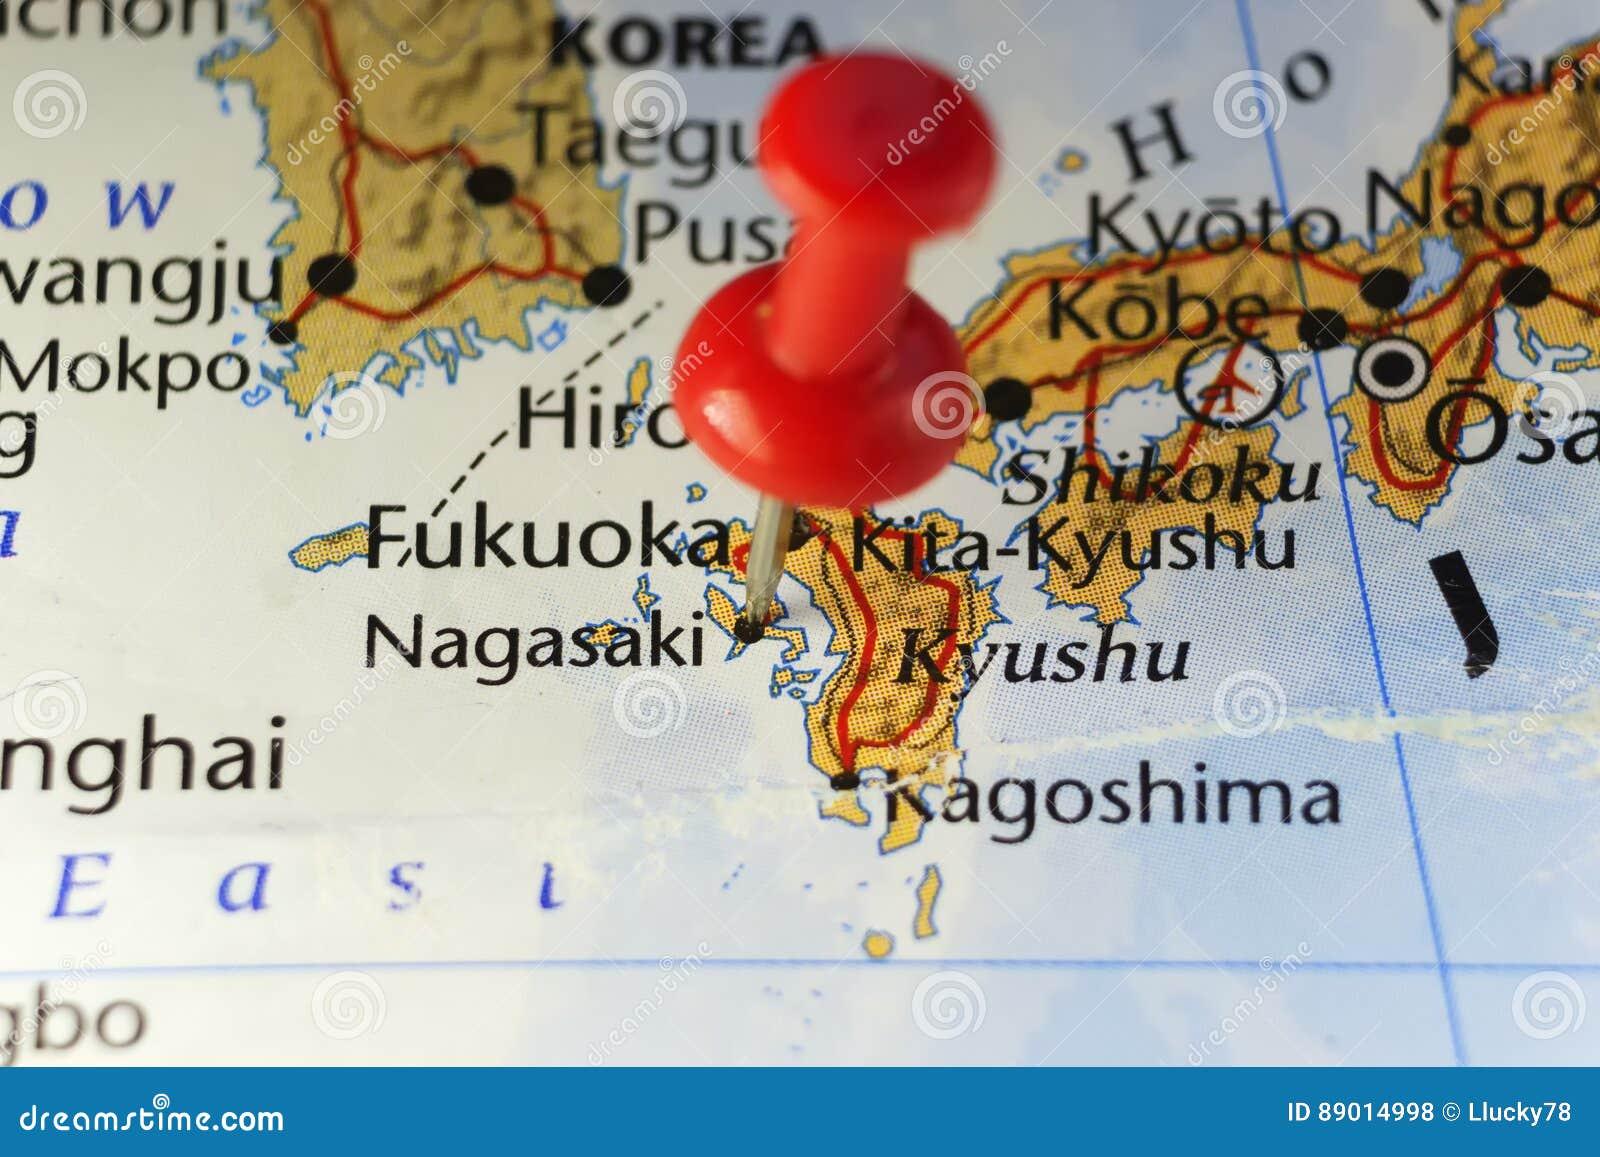 Nagasaki, Japan pinned map